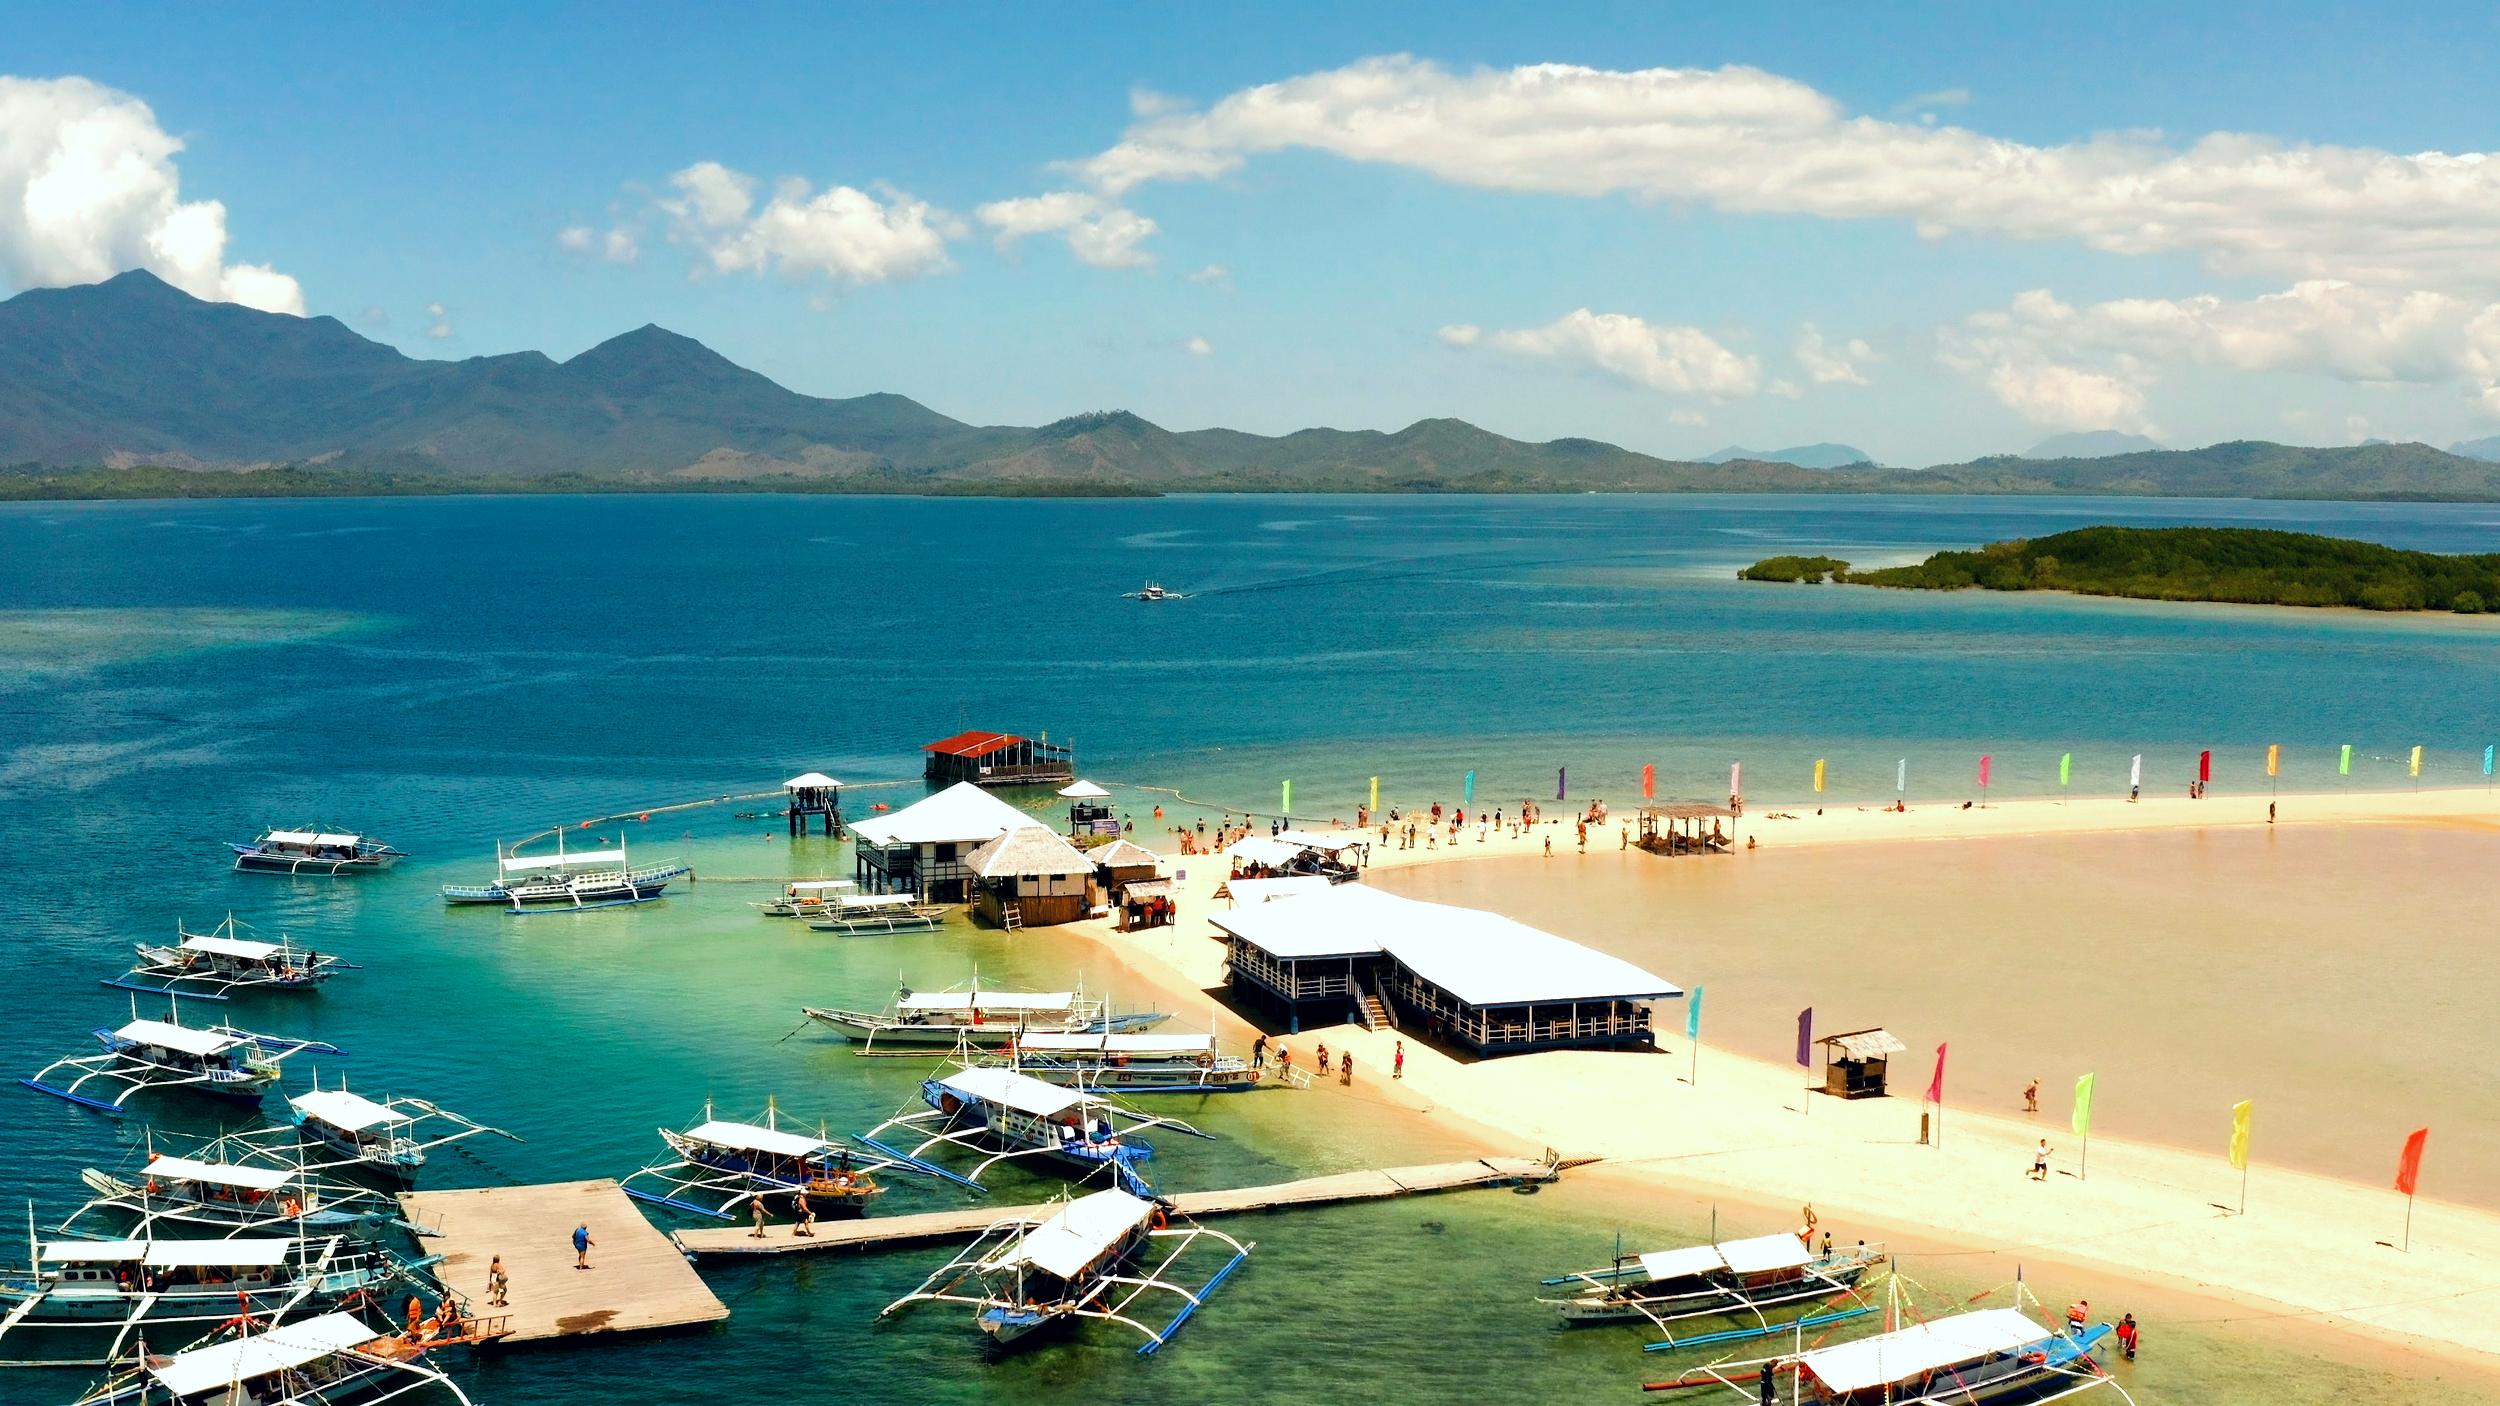 Island-hopping experience in Honda Bay Palawan